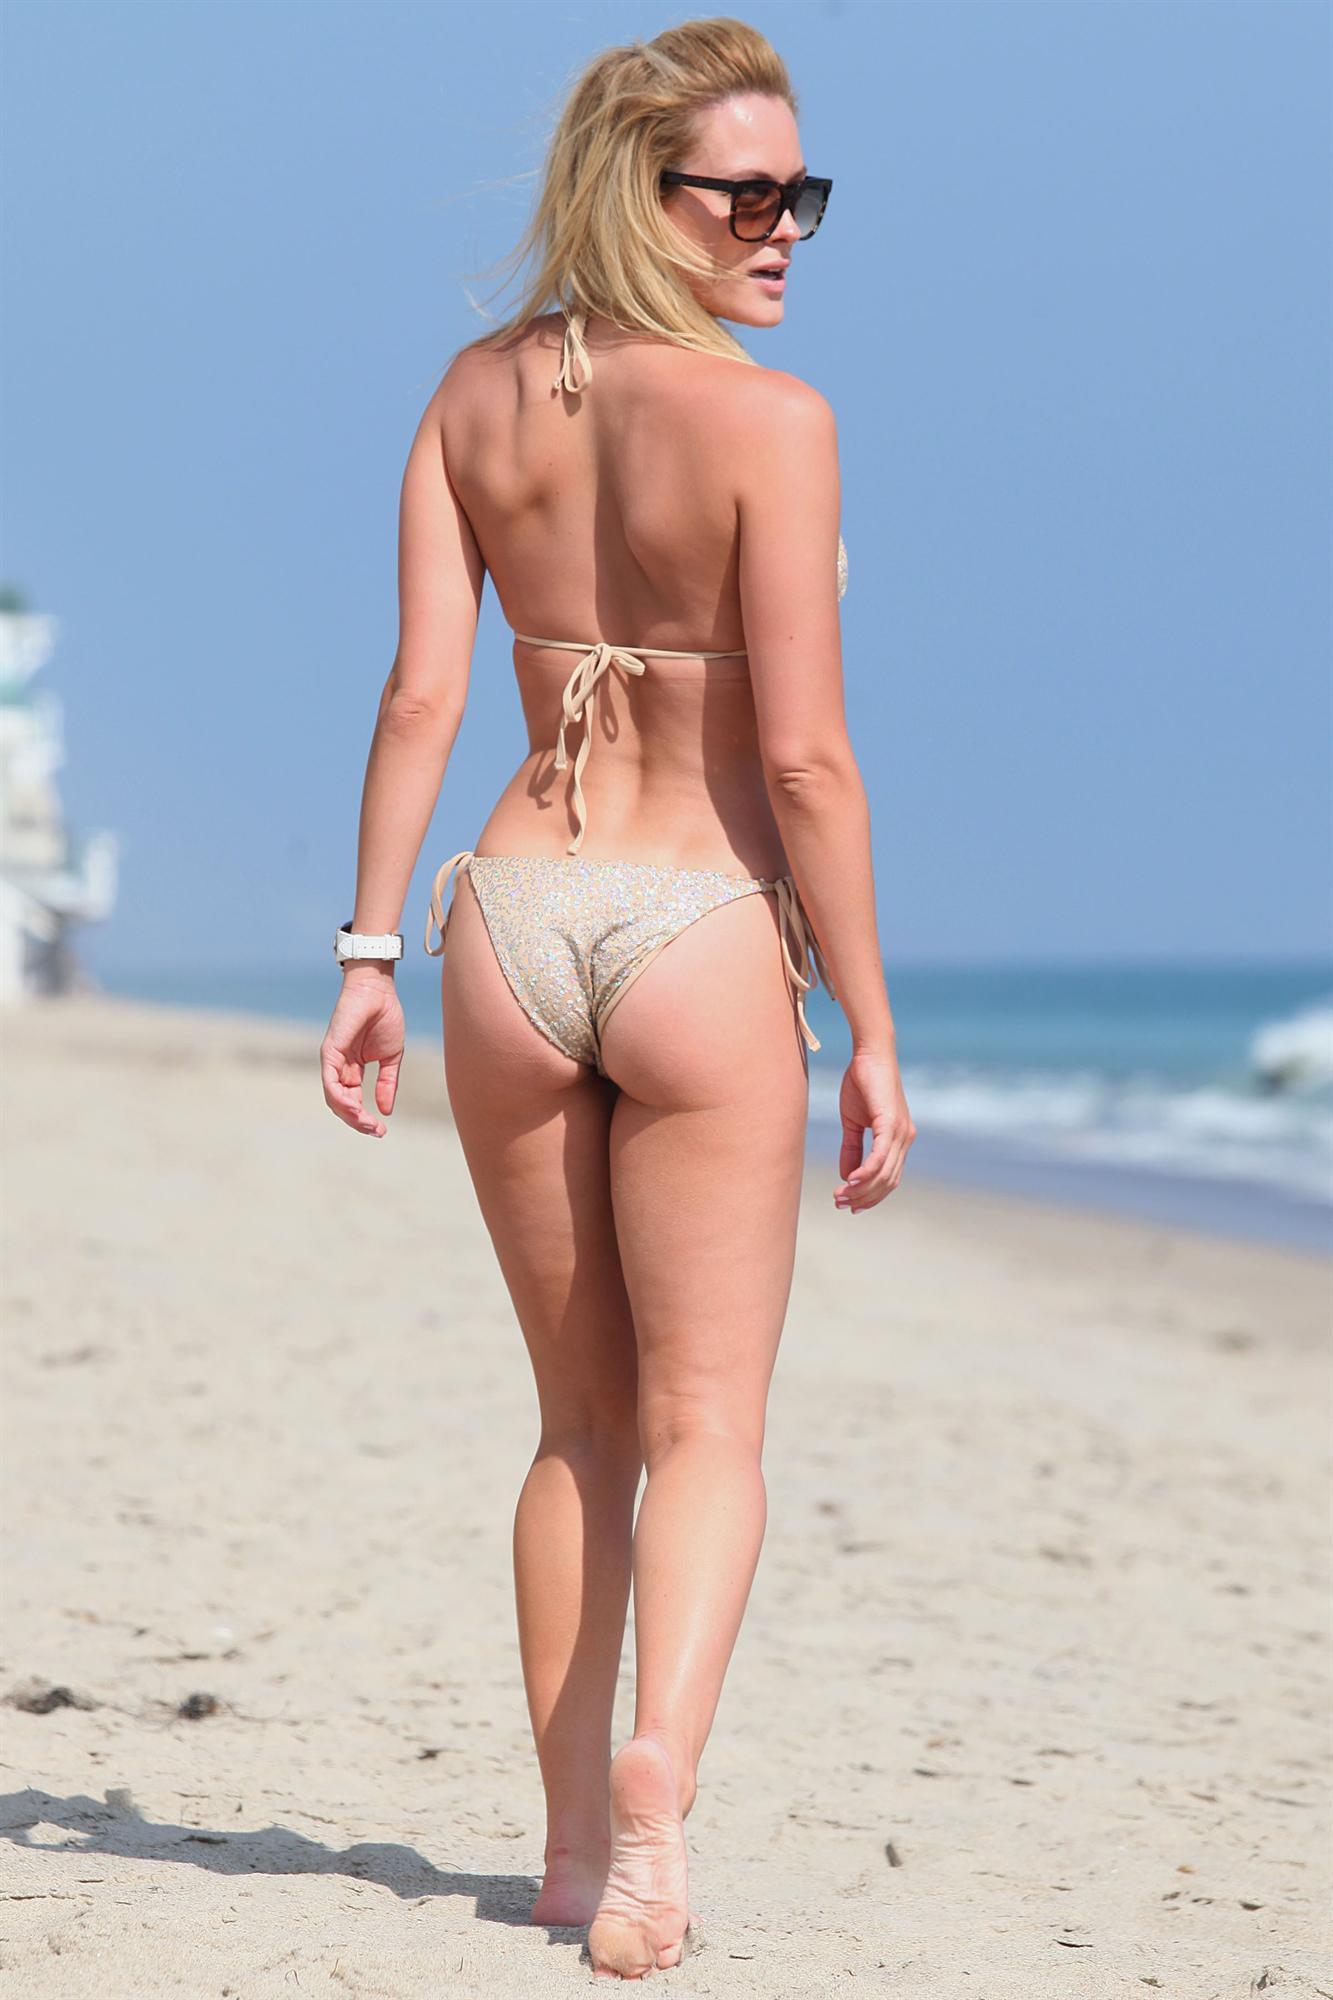 Peta Murgatroyd in a bikini - ass